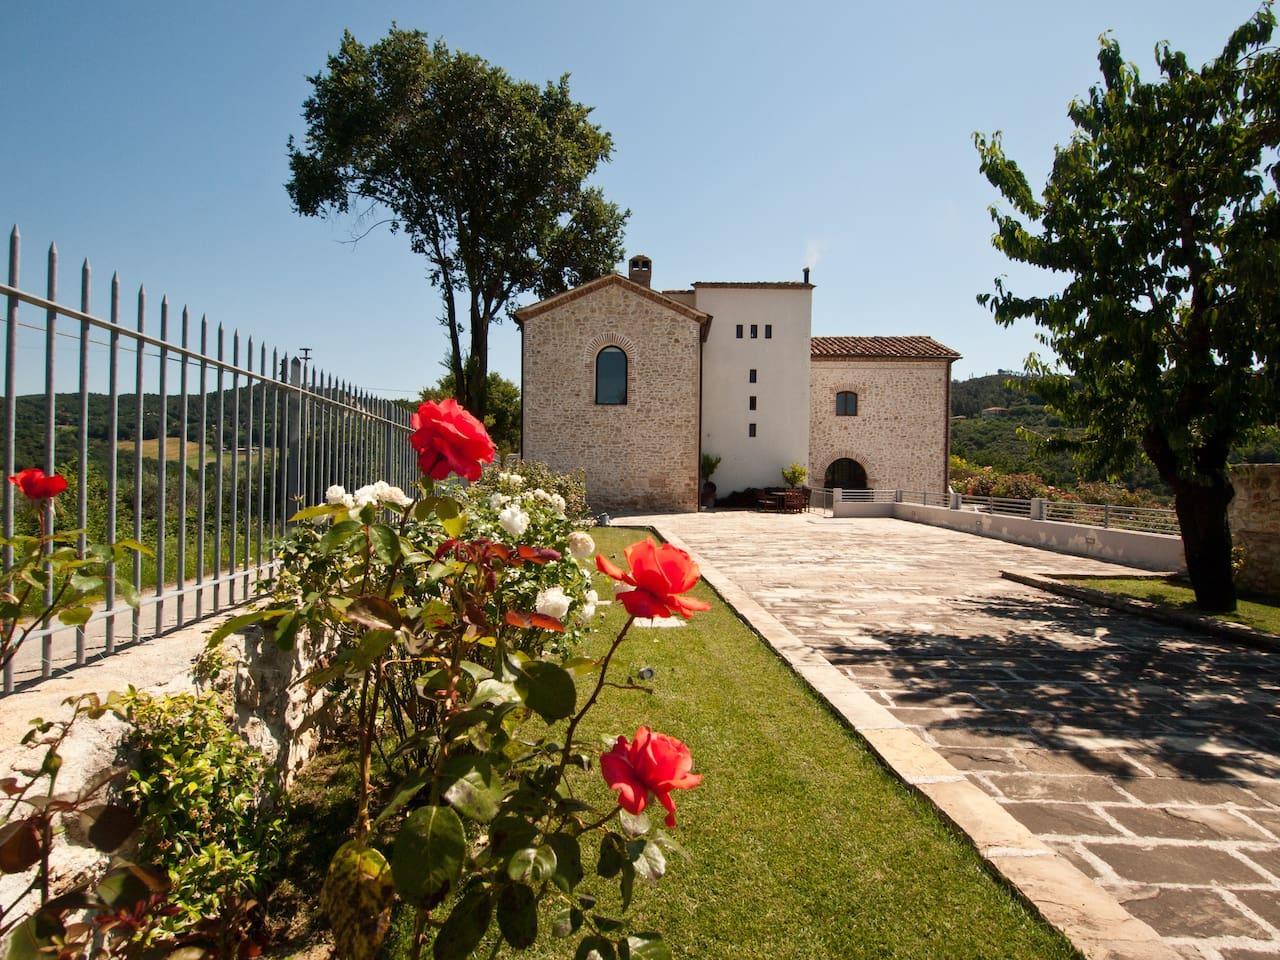 Tenuta San Rocco - San Rocco's Villa